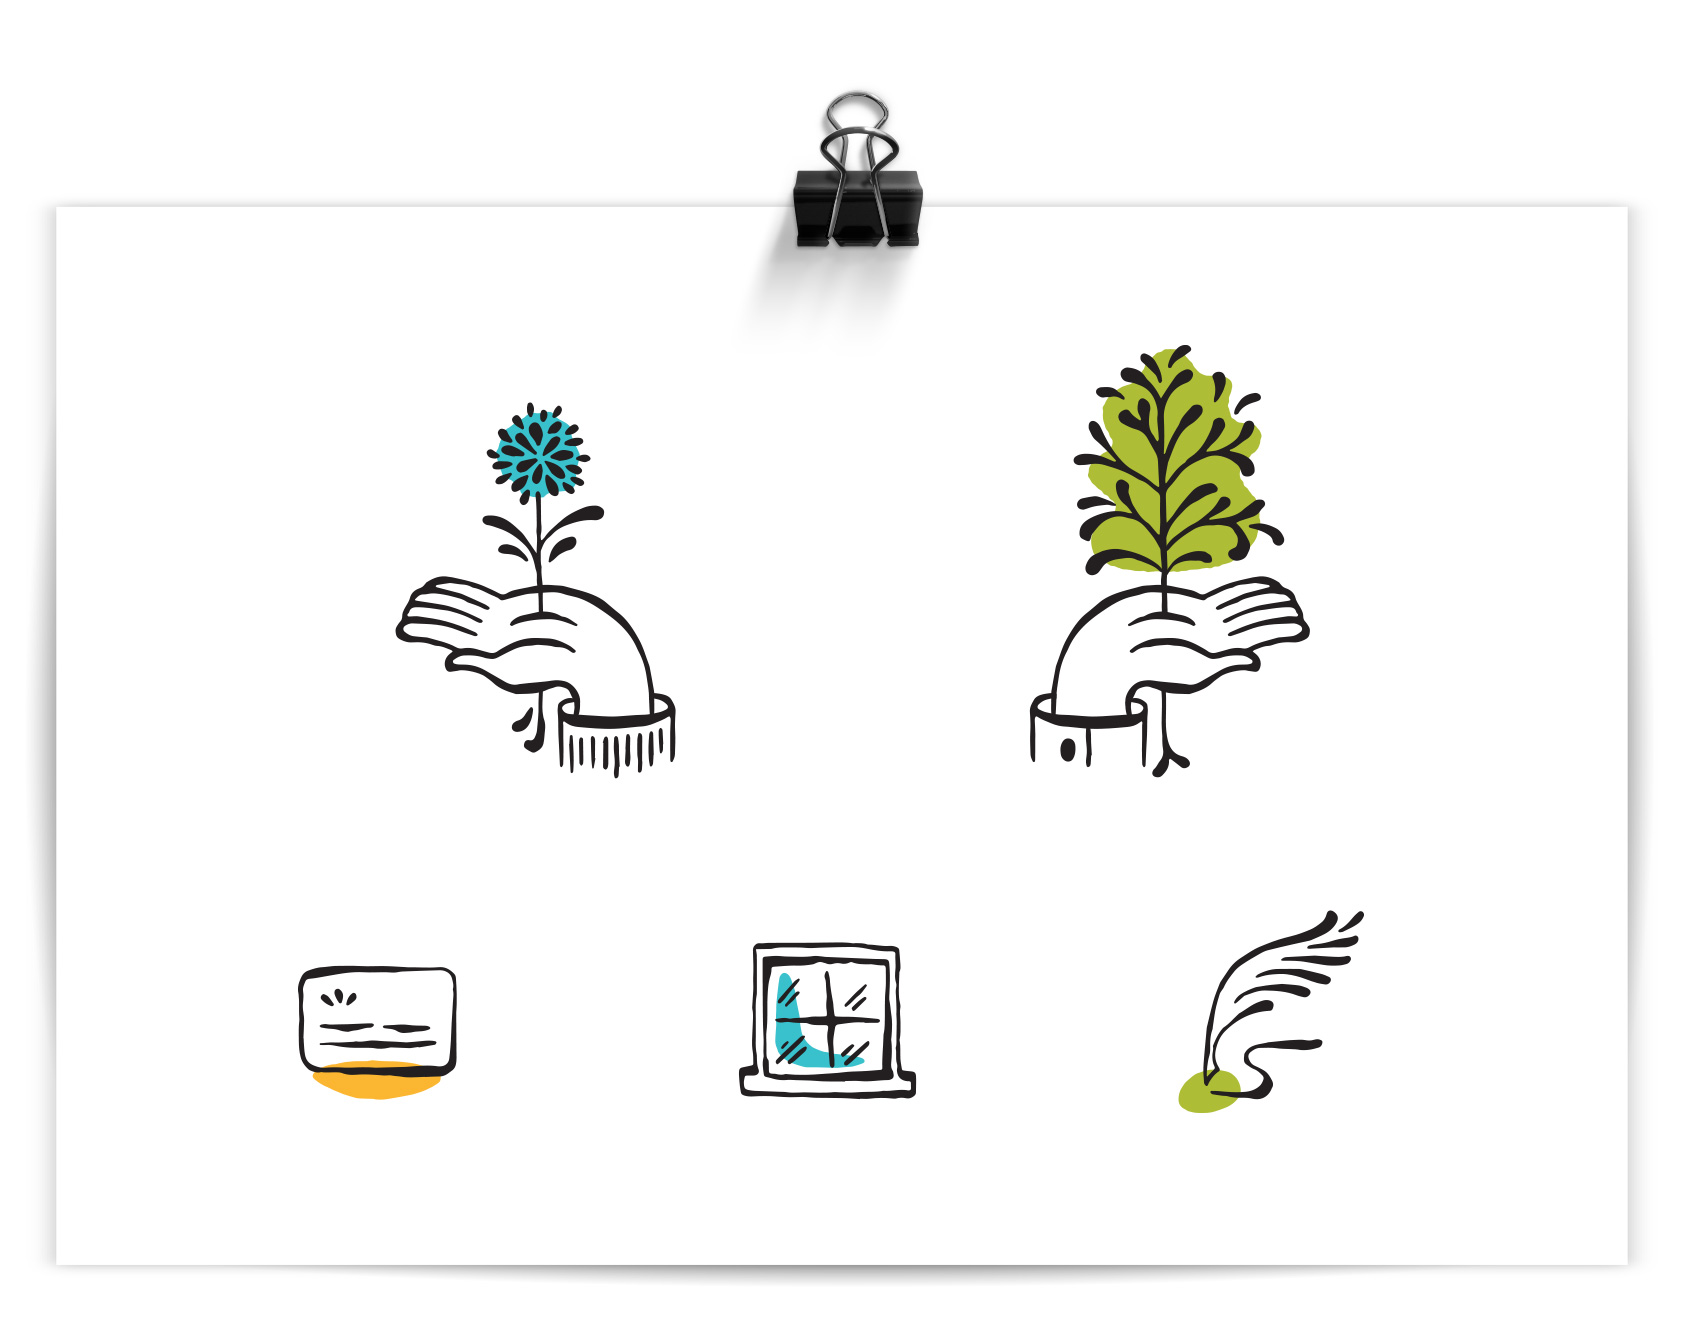 Illustration Test for Umpqua Bank